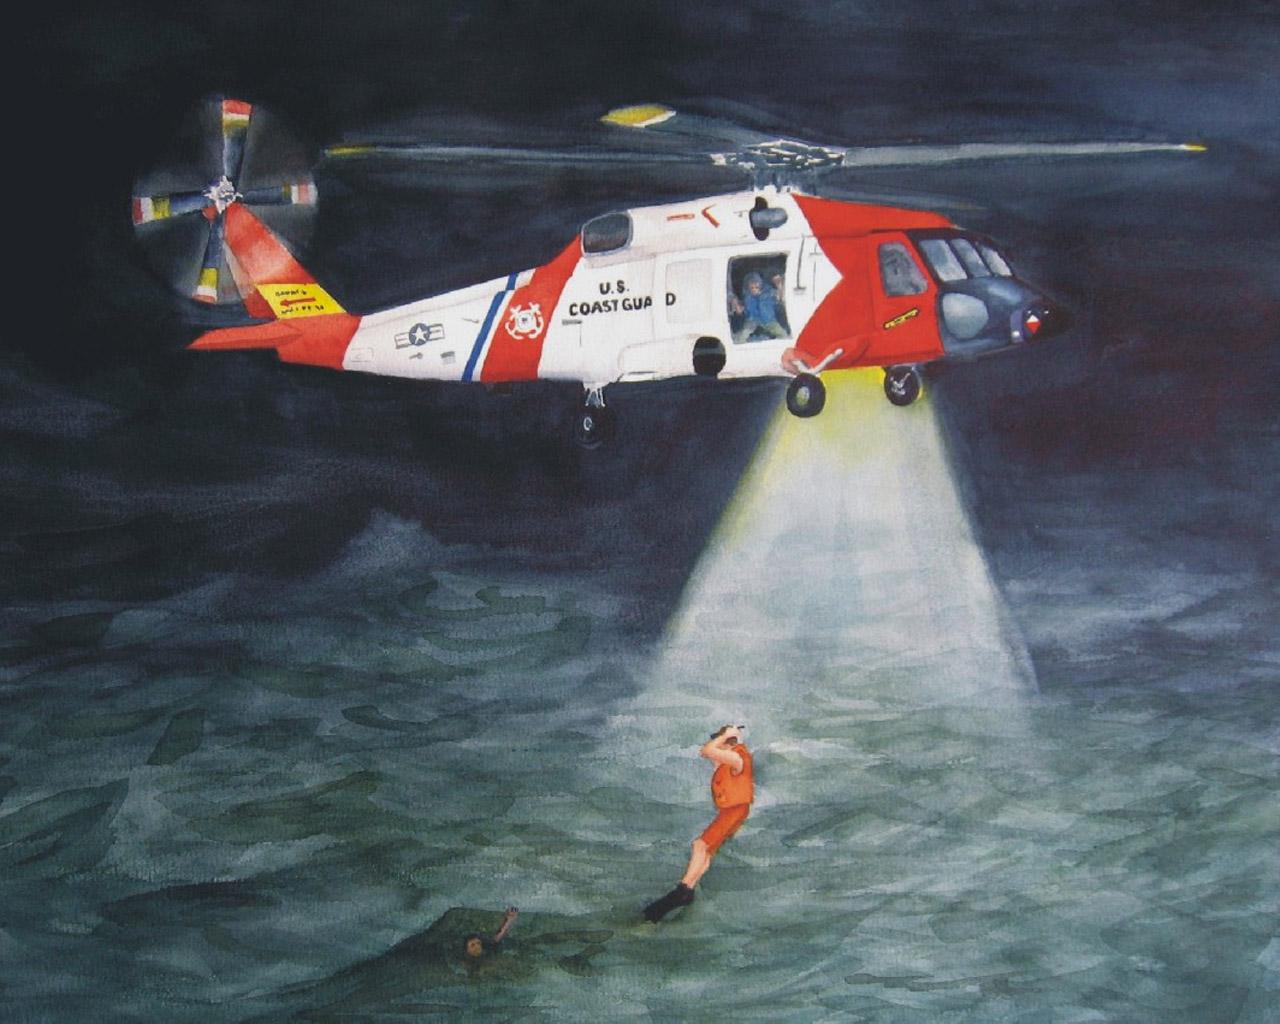 Us coast guard wallpaper free hd backgrounds images pictures - Coast guard wallpaper ...